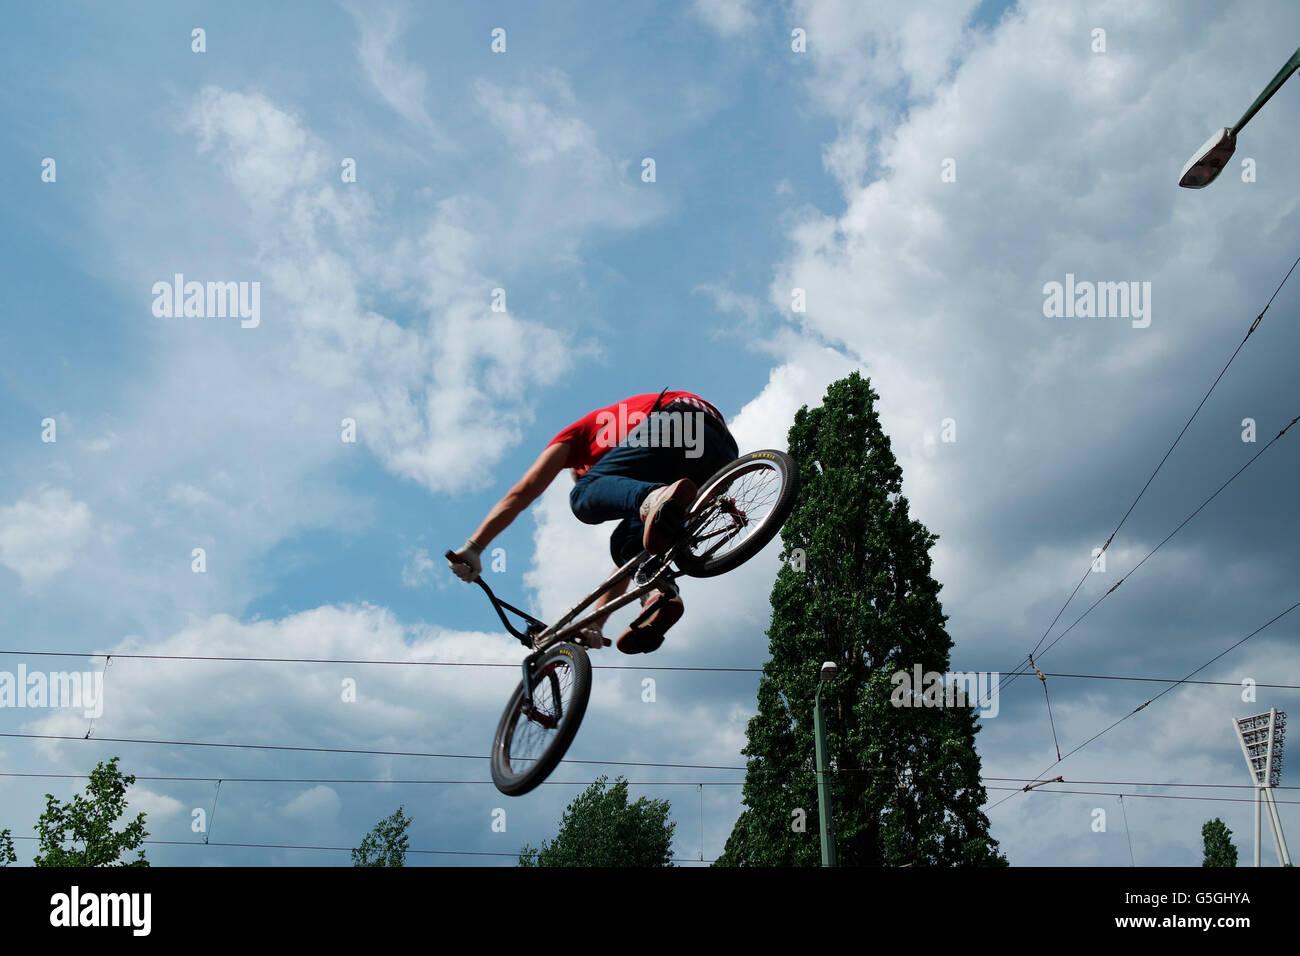 Impressionen - Fahrrad-Fest am Mauerpark, 21. Mai 2016, Berlin. - Stock Image